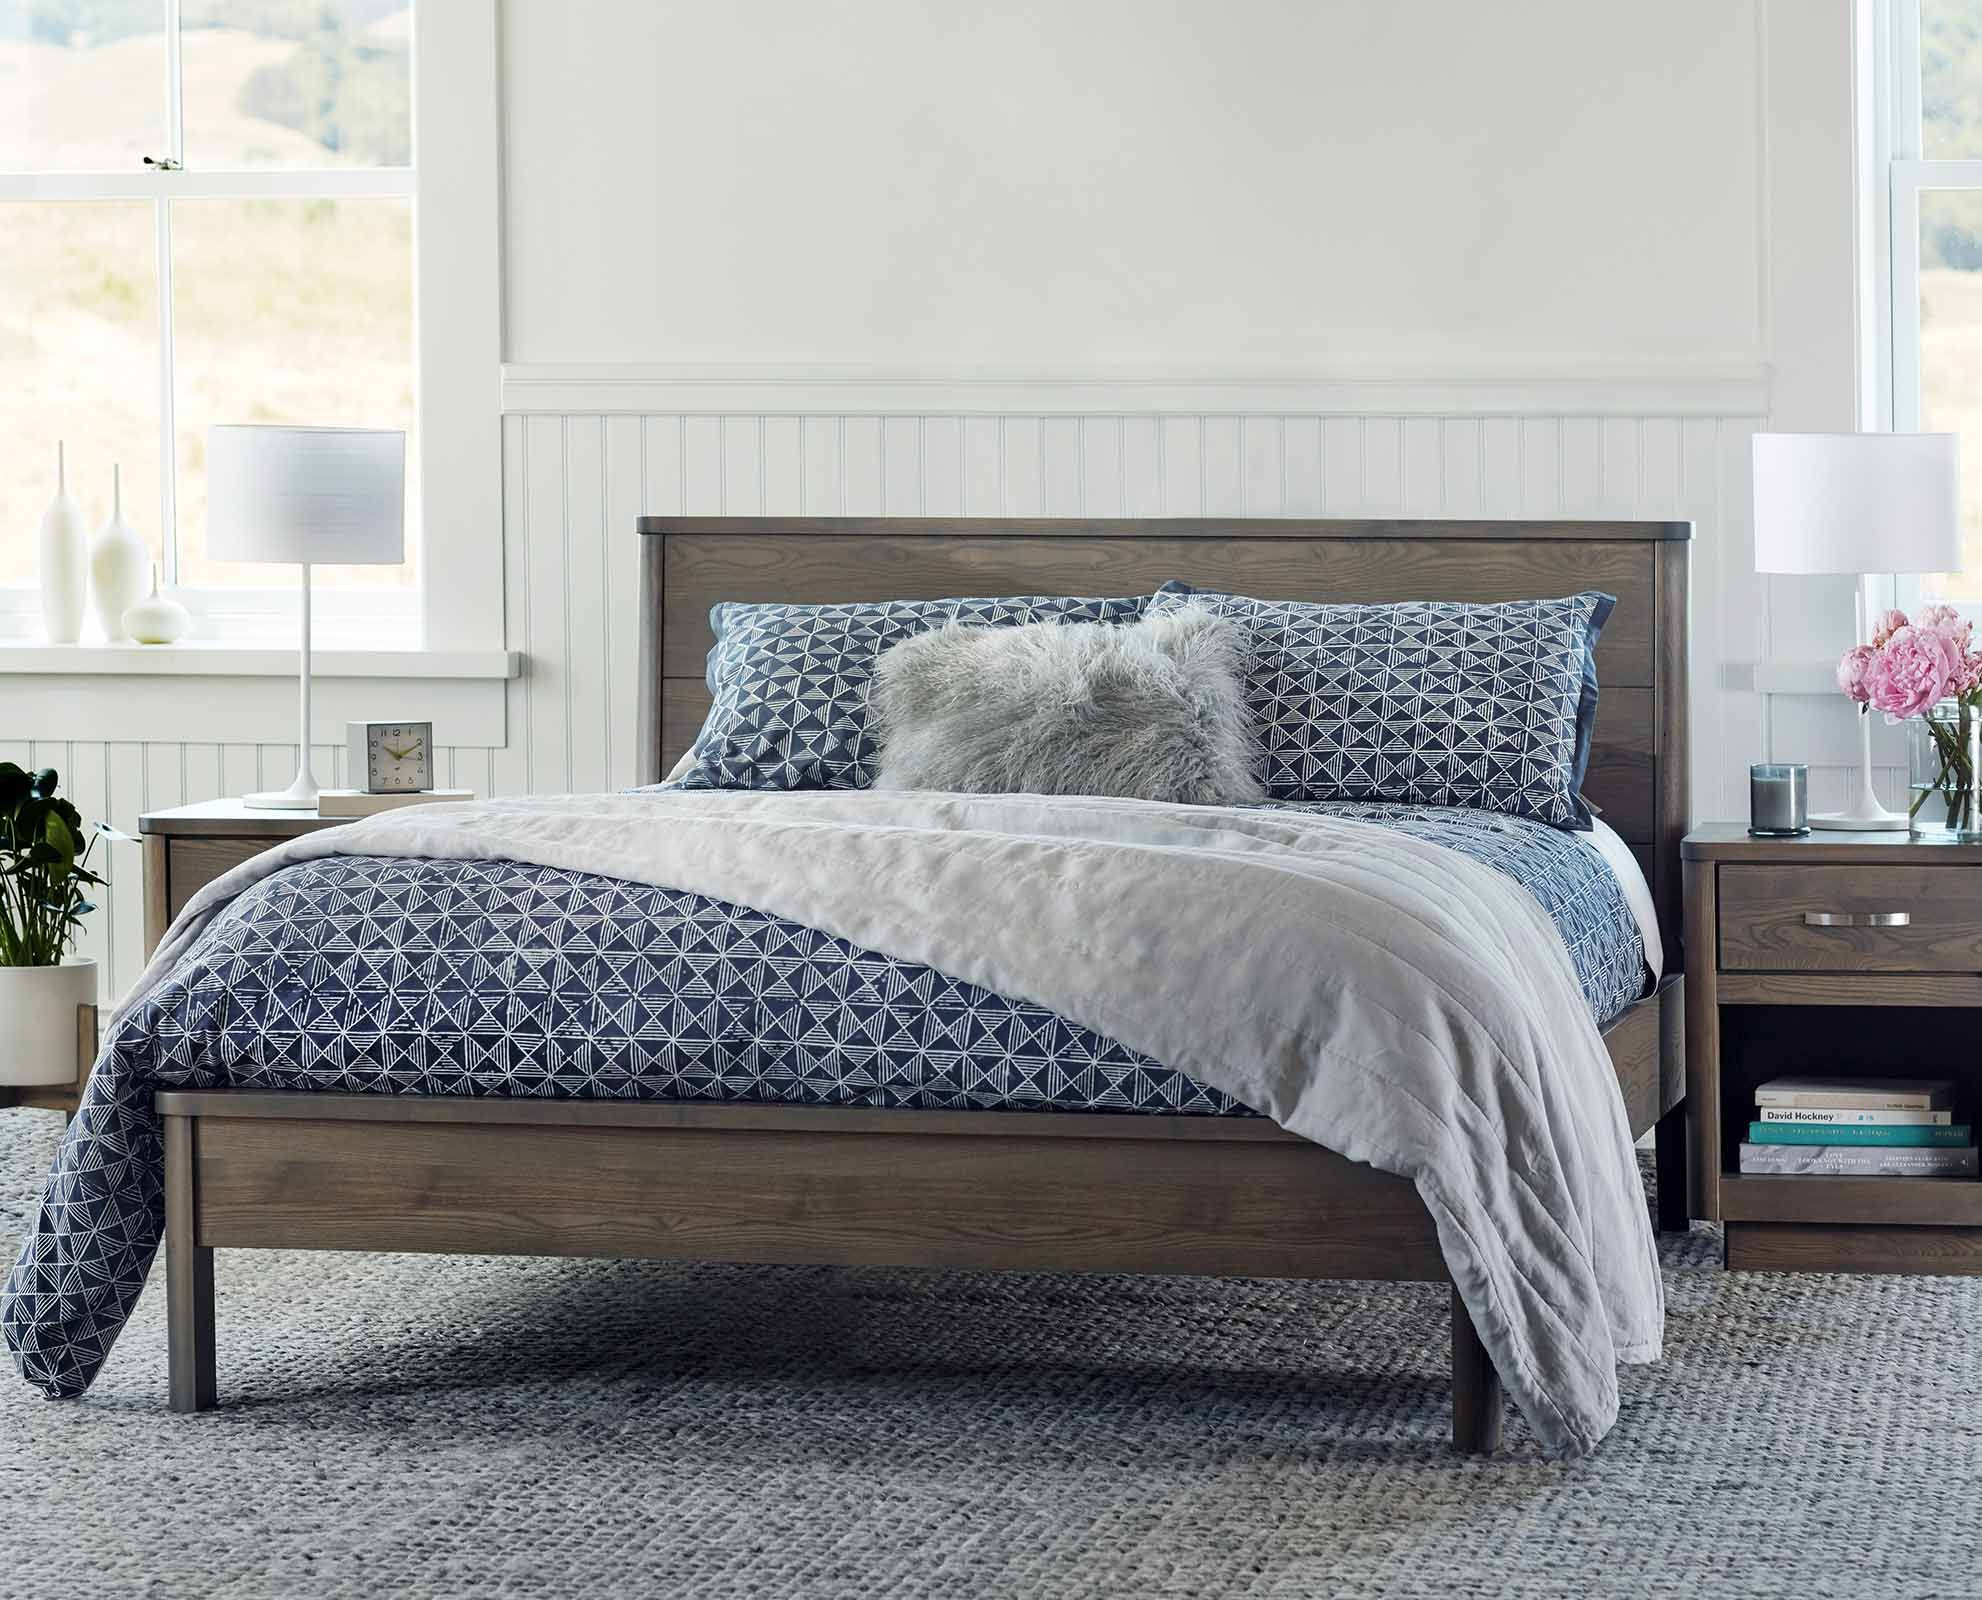 Ash Wood Bedroom Furniture